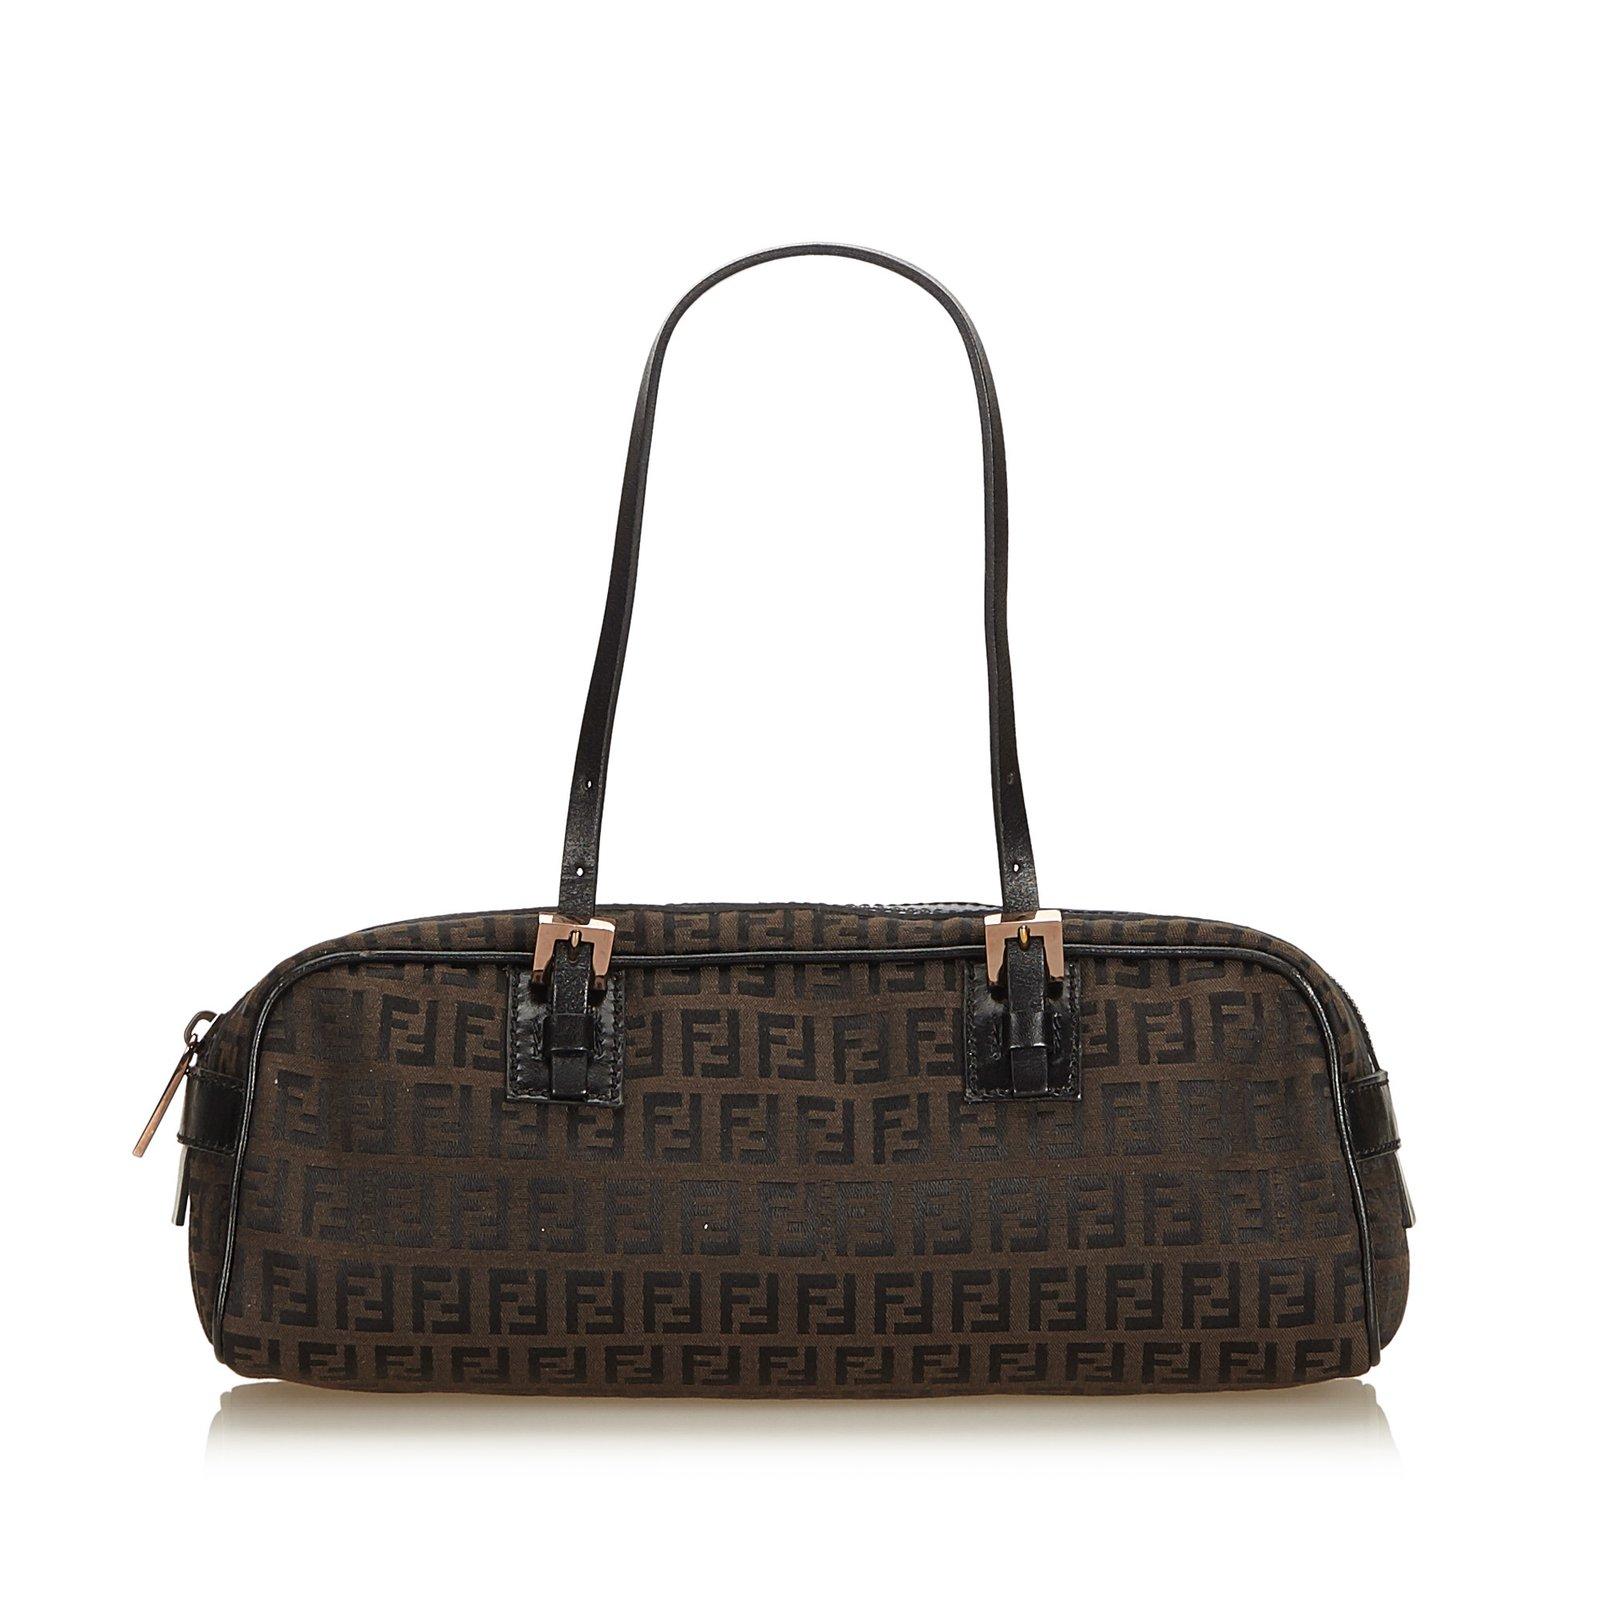 1e11a0585f Fendi Zucchino Jacquard Shoulder Bag Handbags Leather